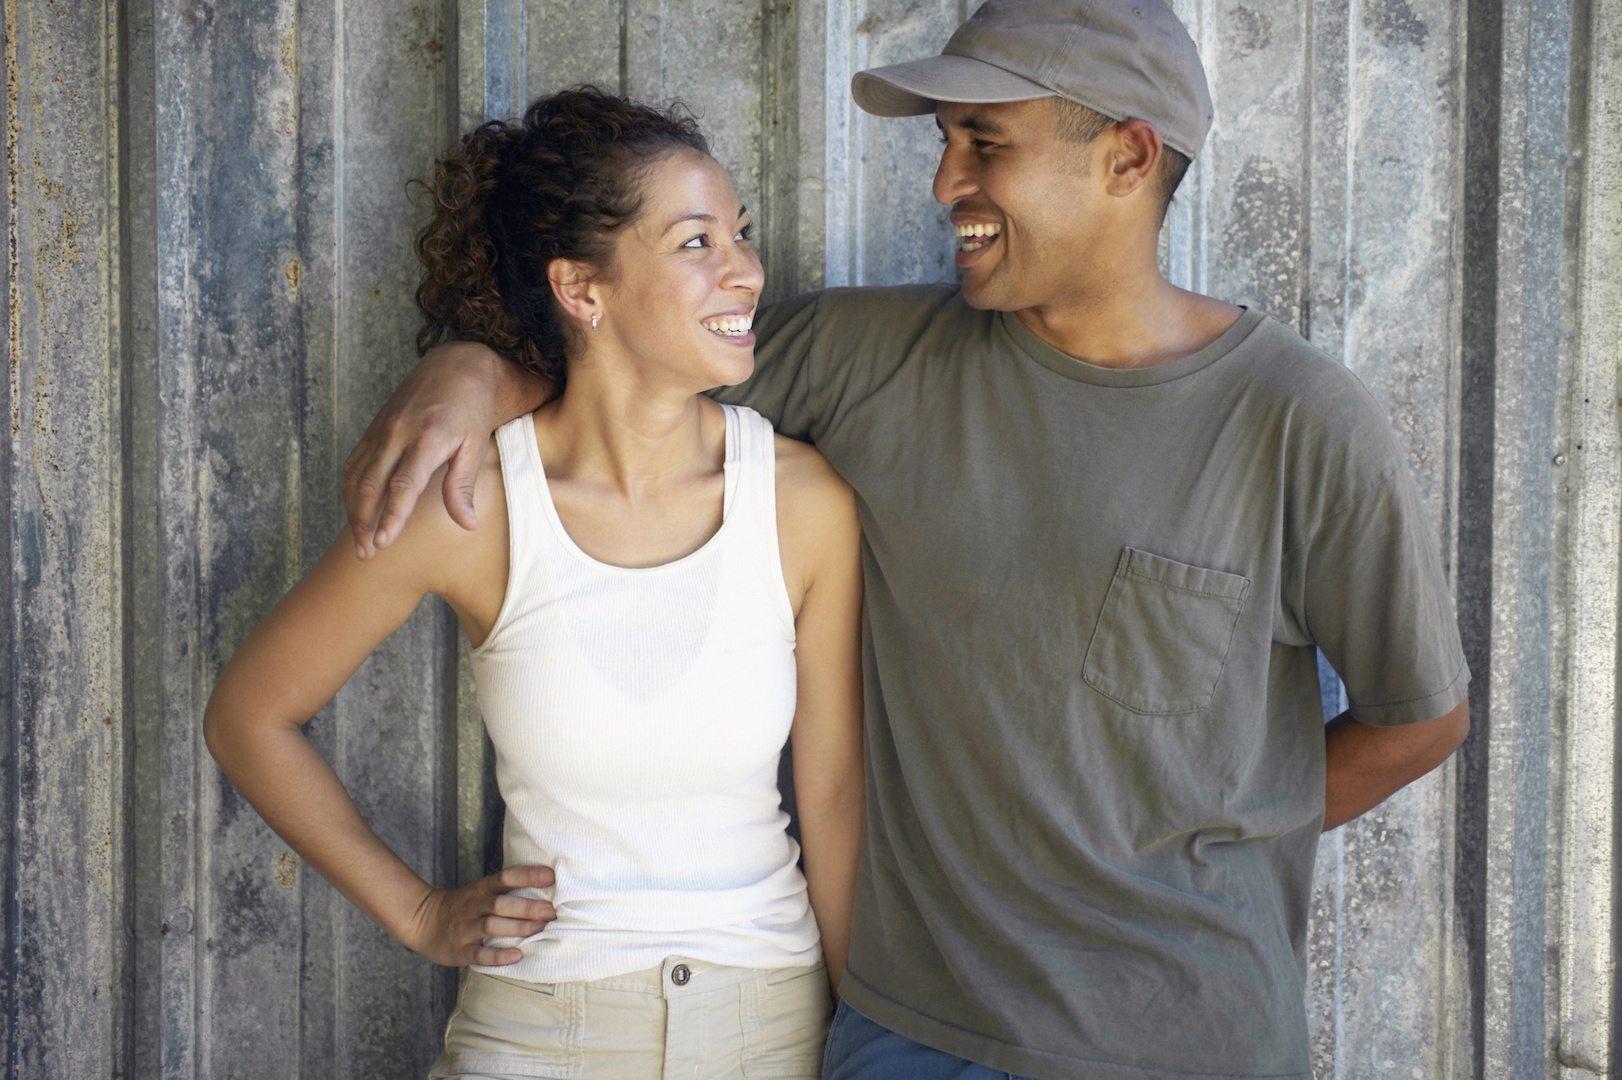 Smiling through Irritations - AdobeStock_39591176 copy